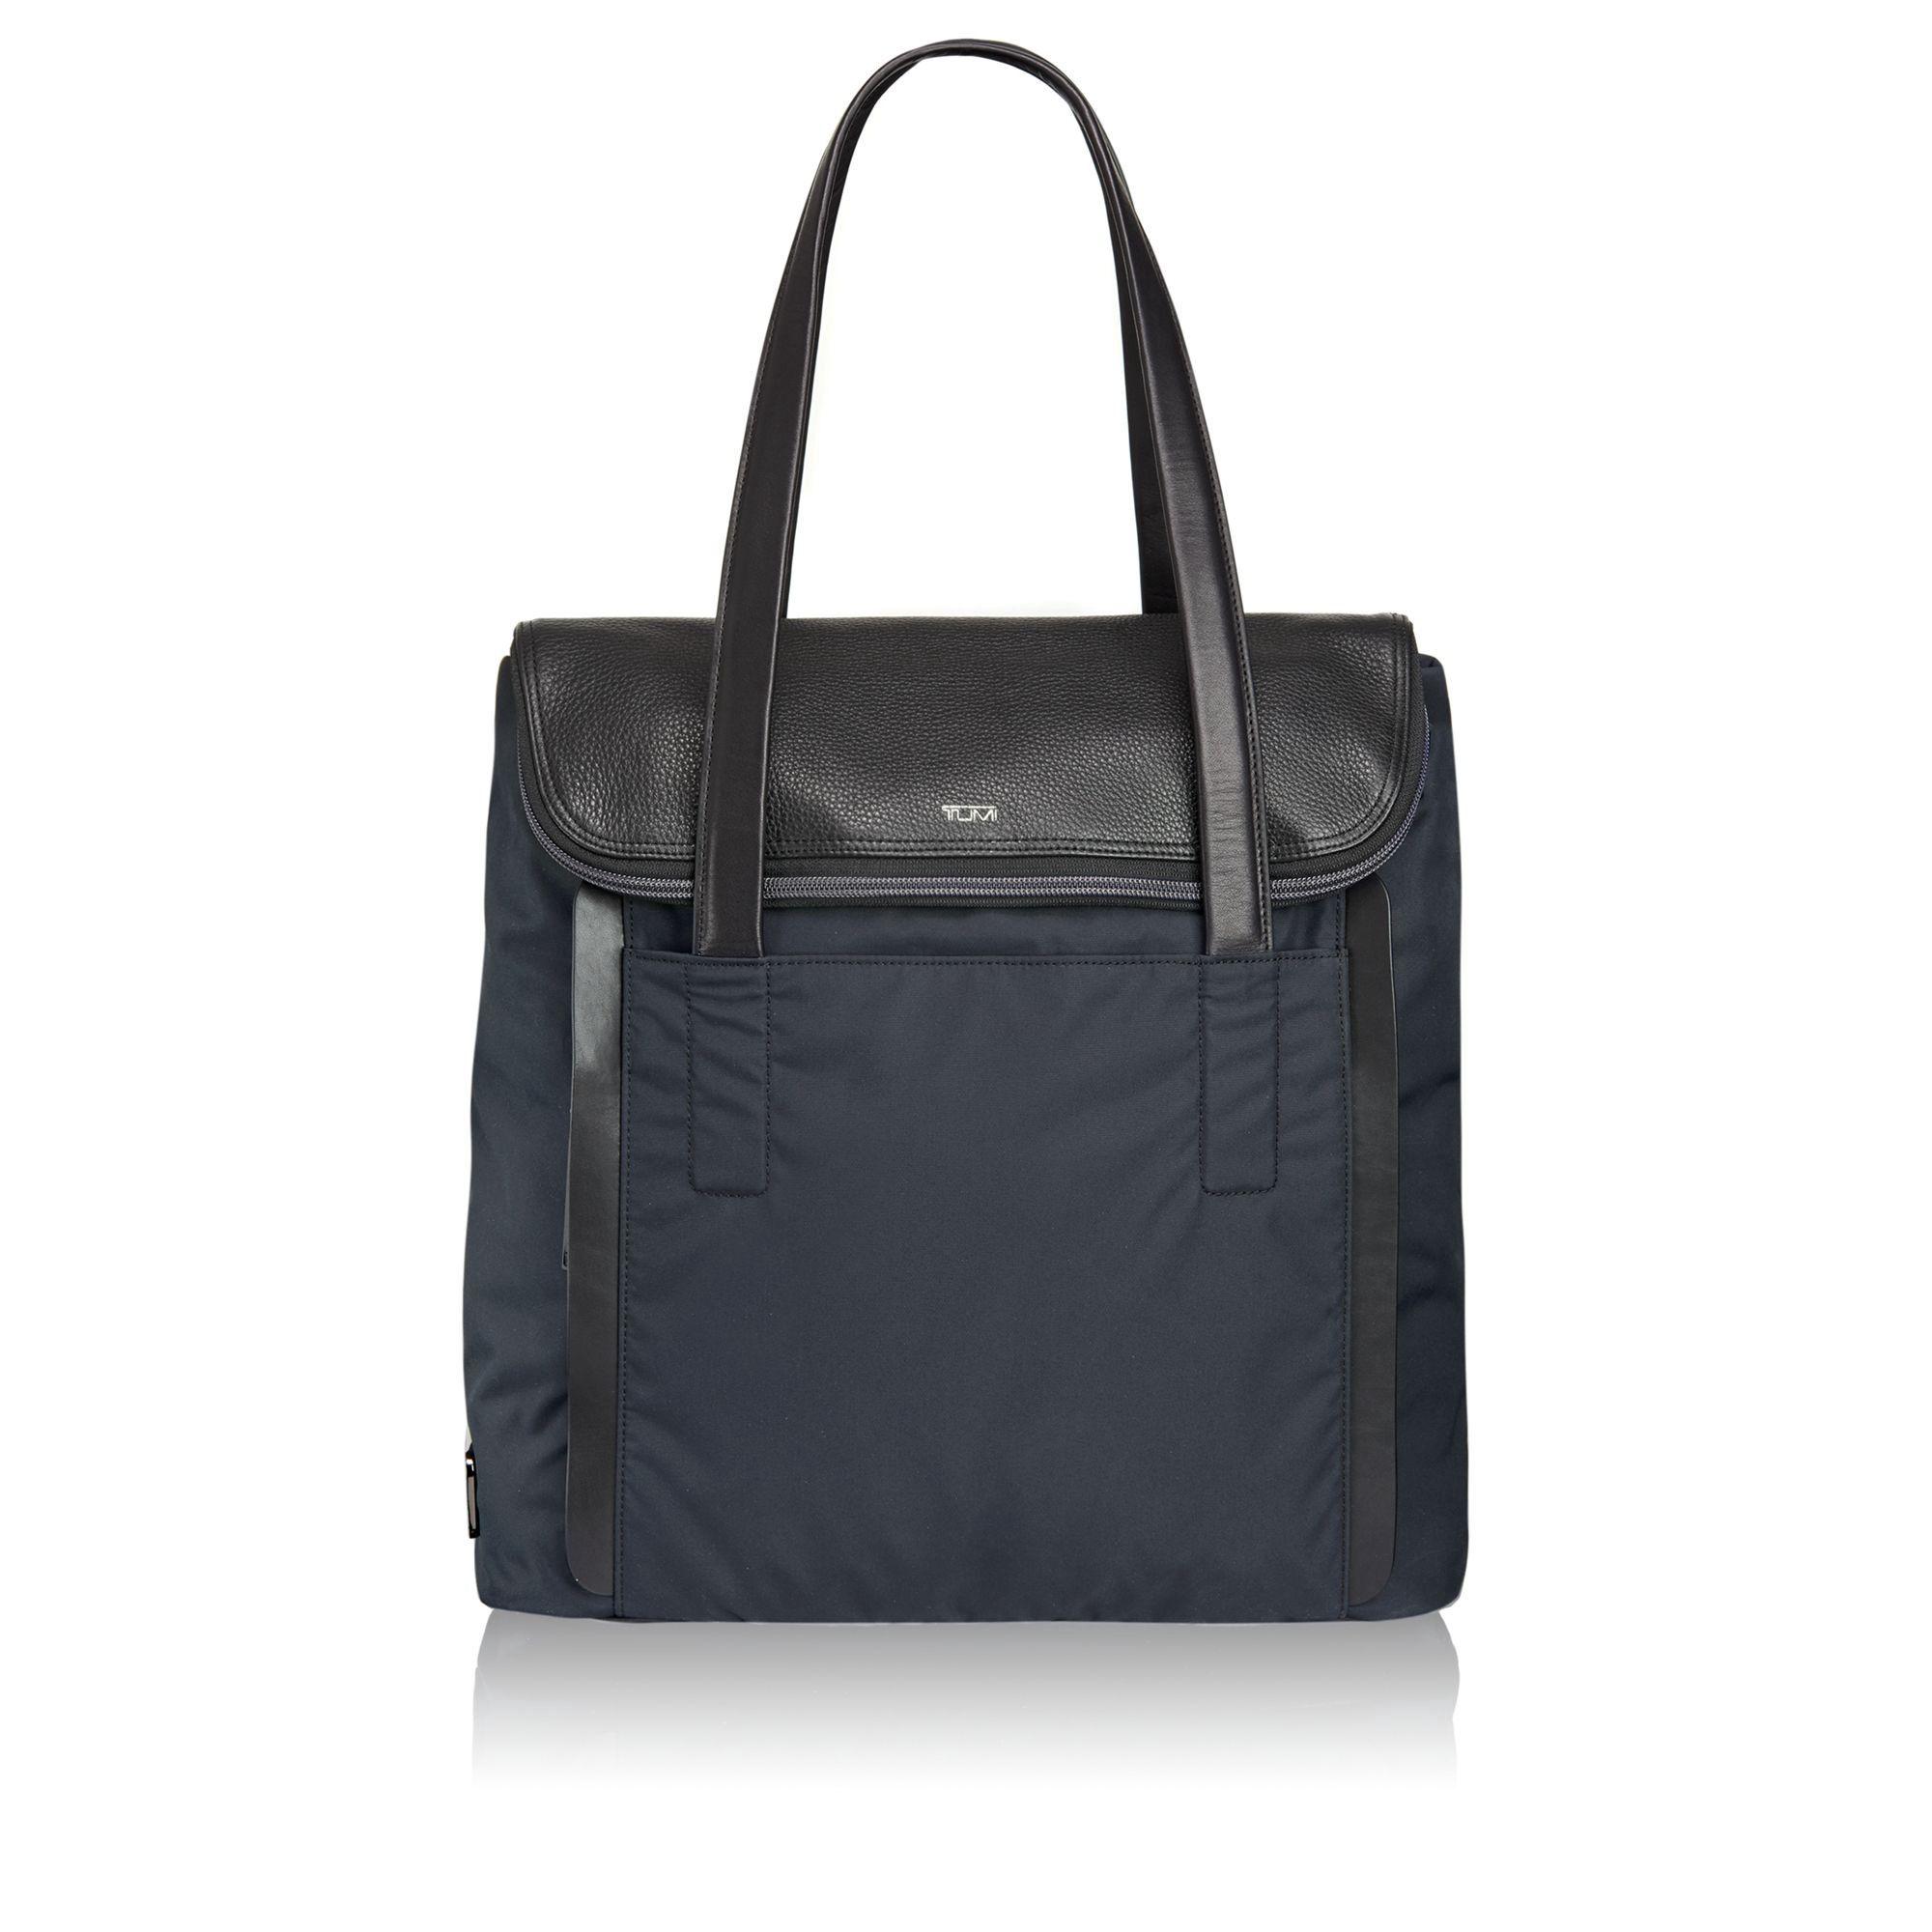 a72bf20e10 TUMI Clark Tote - Navy.  tumi  bags  leather  hand bags  tote ...